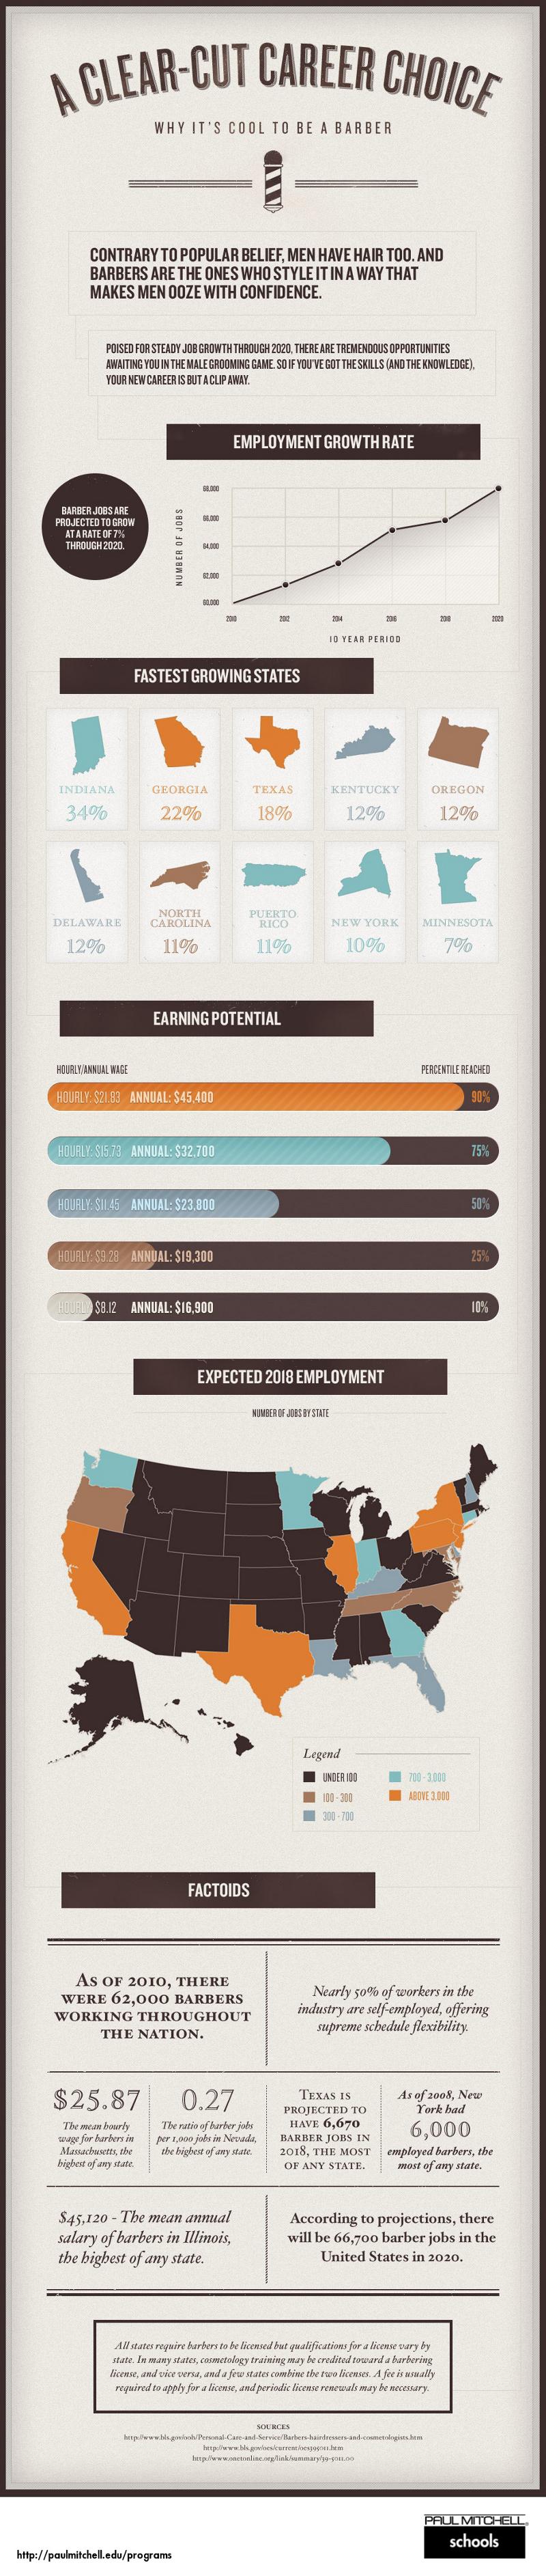 Barber Shop Industry Statistics